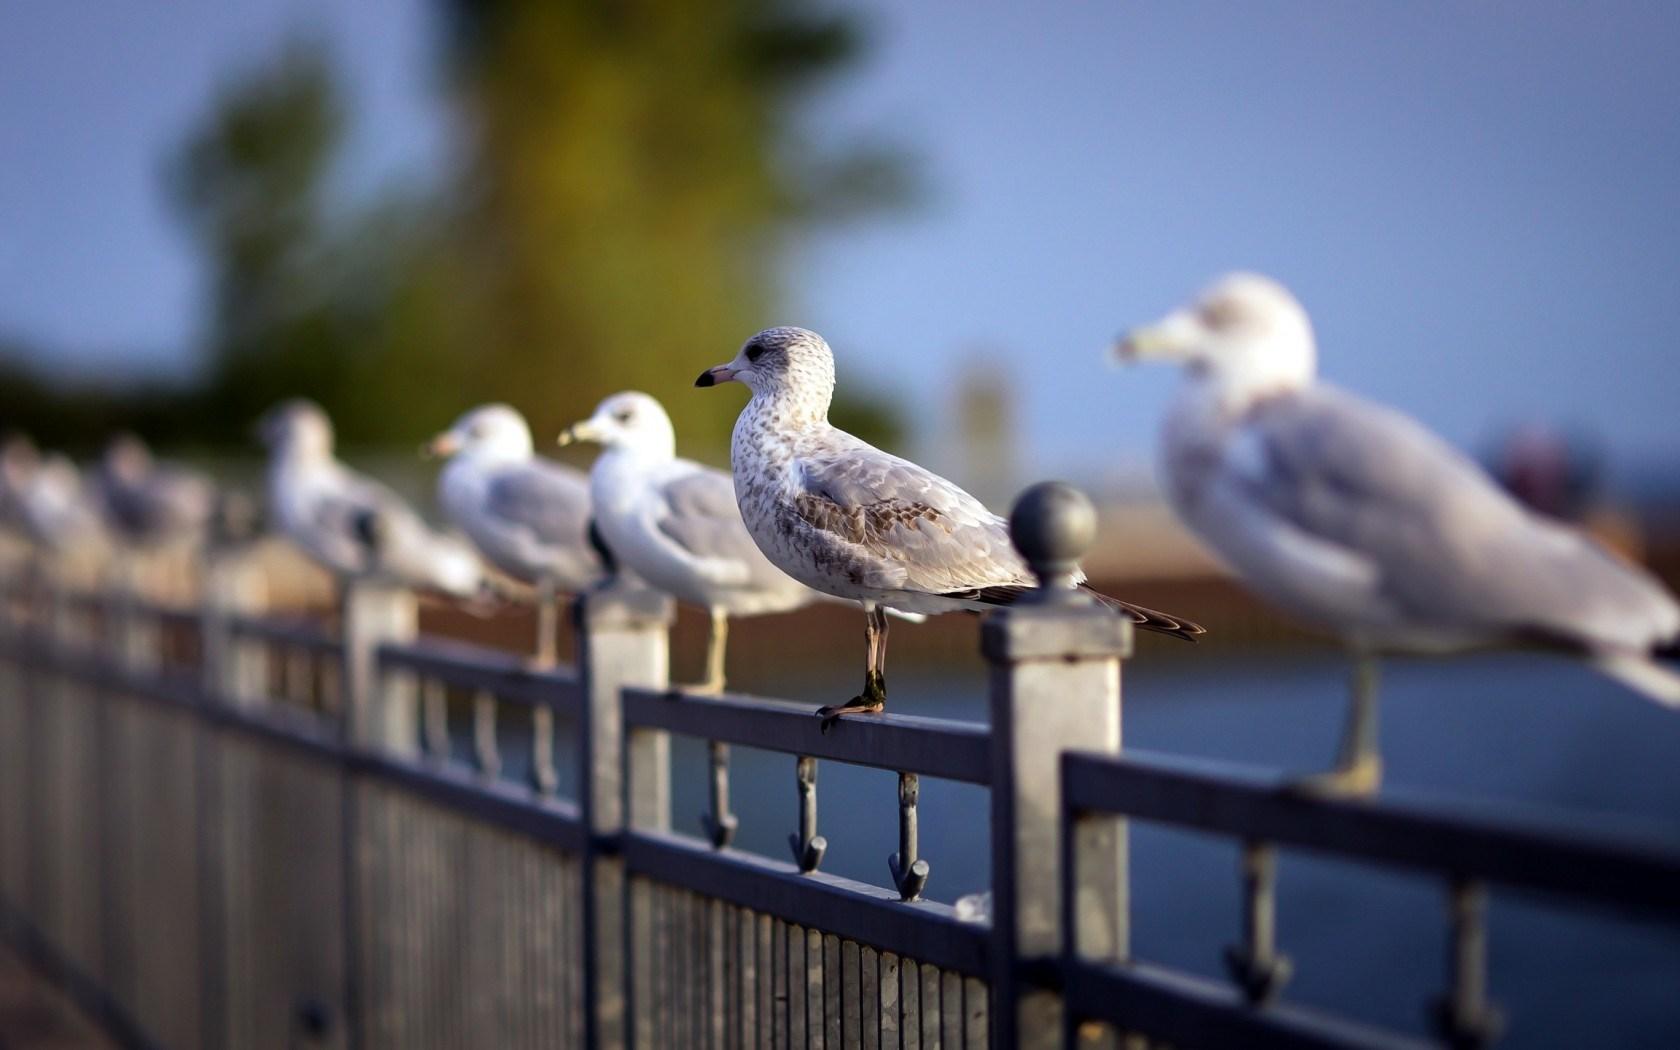 Bridge Metal Fence Seagulls Birds HD Wallpaper